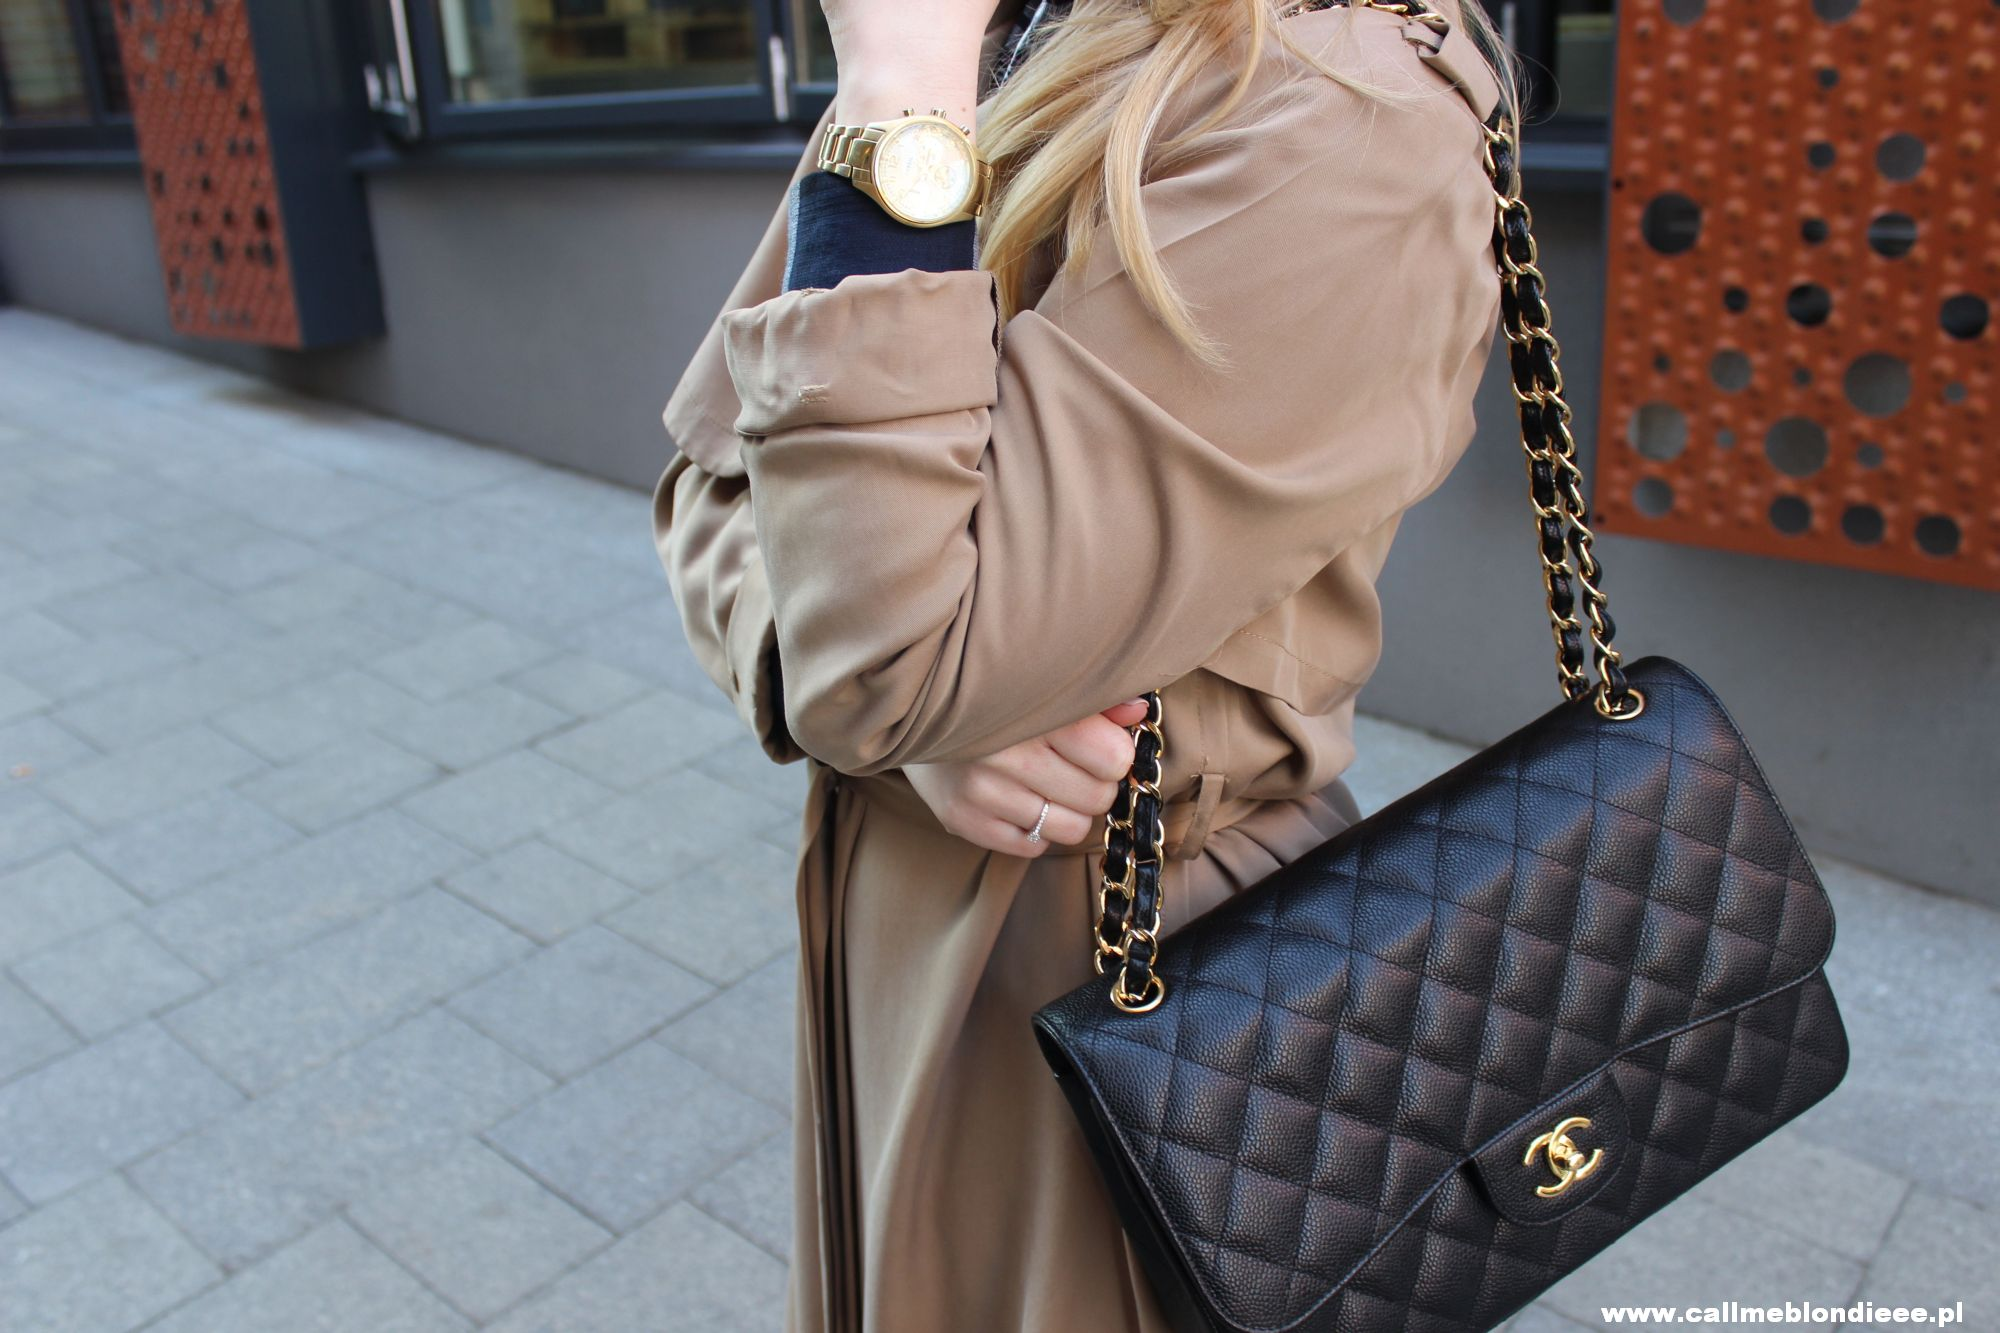 OOTD - Classic Look & Classic Bag 5